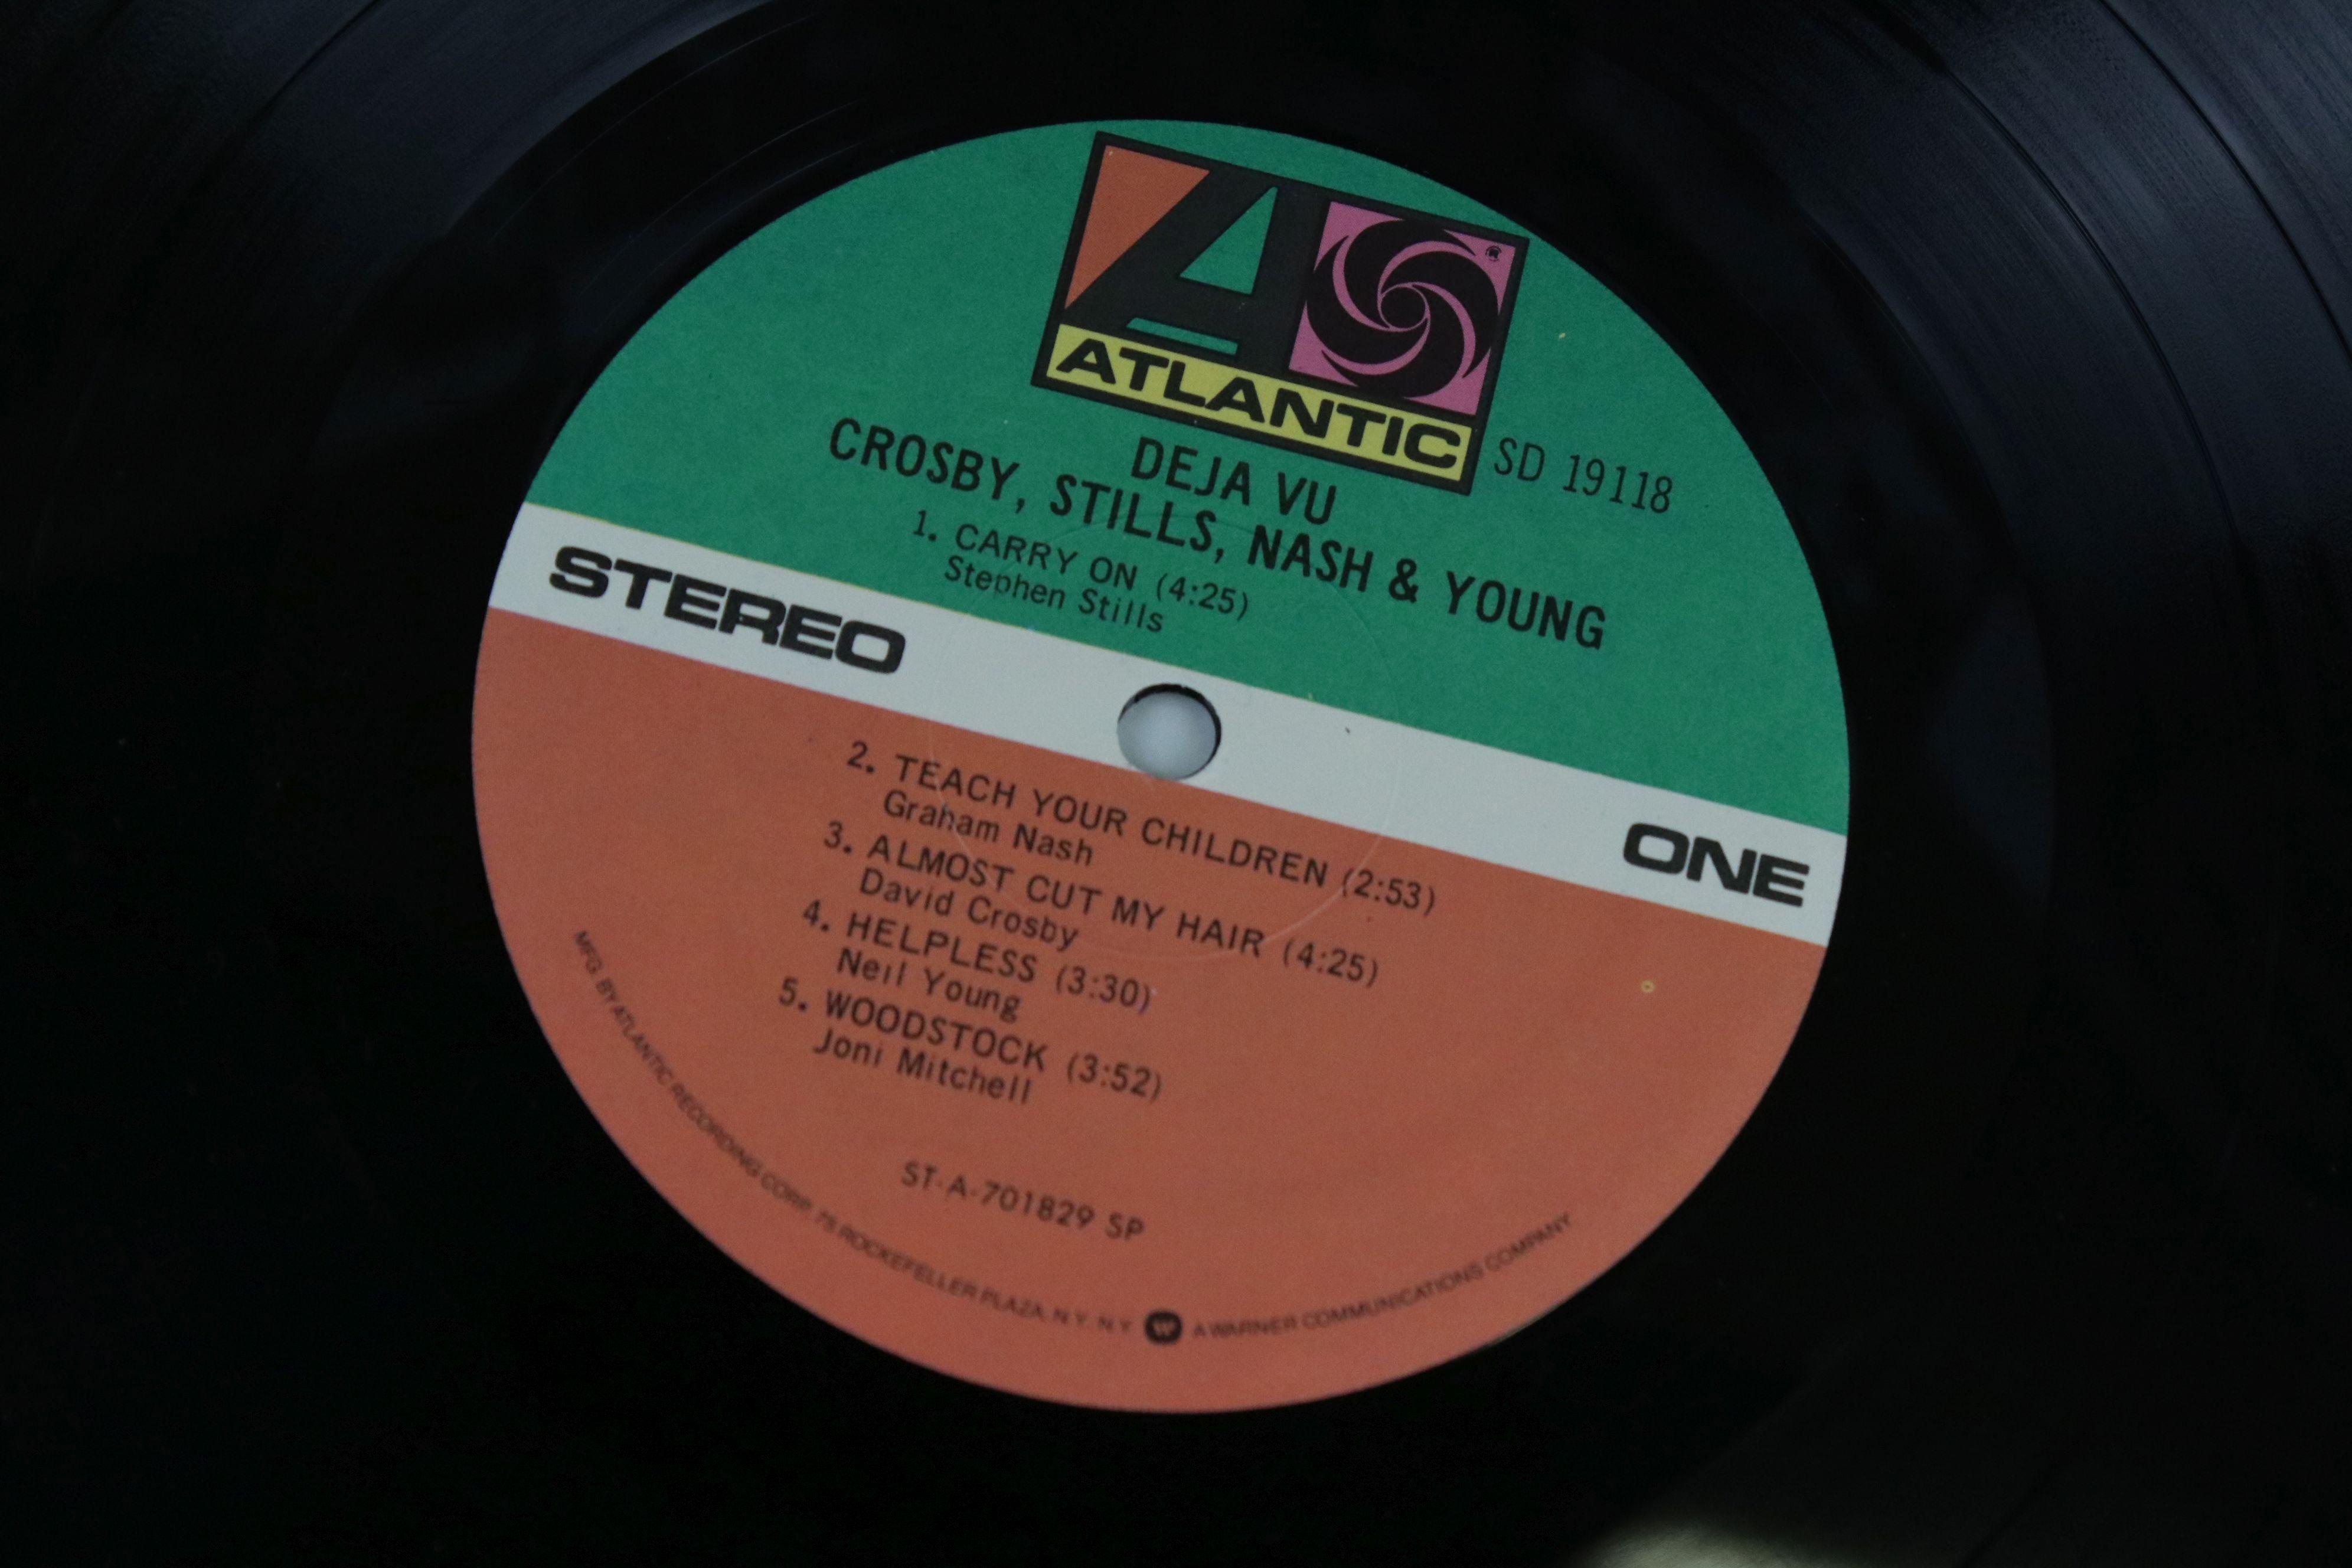 Signed Vinyl - Crosby Stills Nash & Young Deja Vu LP US pressing on Atlantic SD19118, signed by - Image 3 of 4